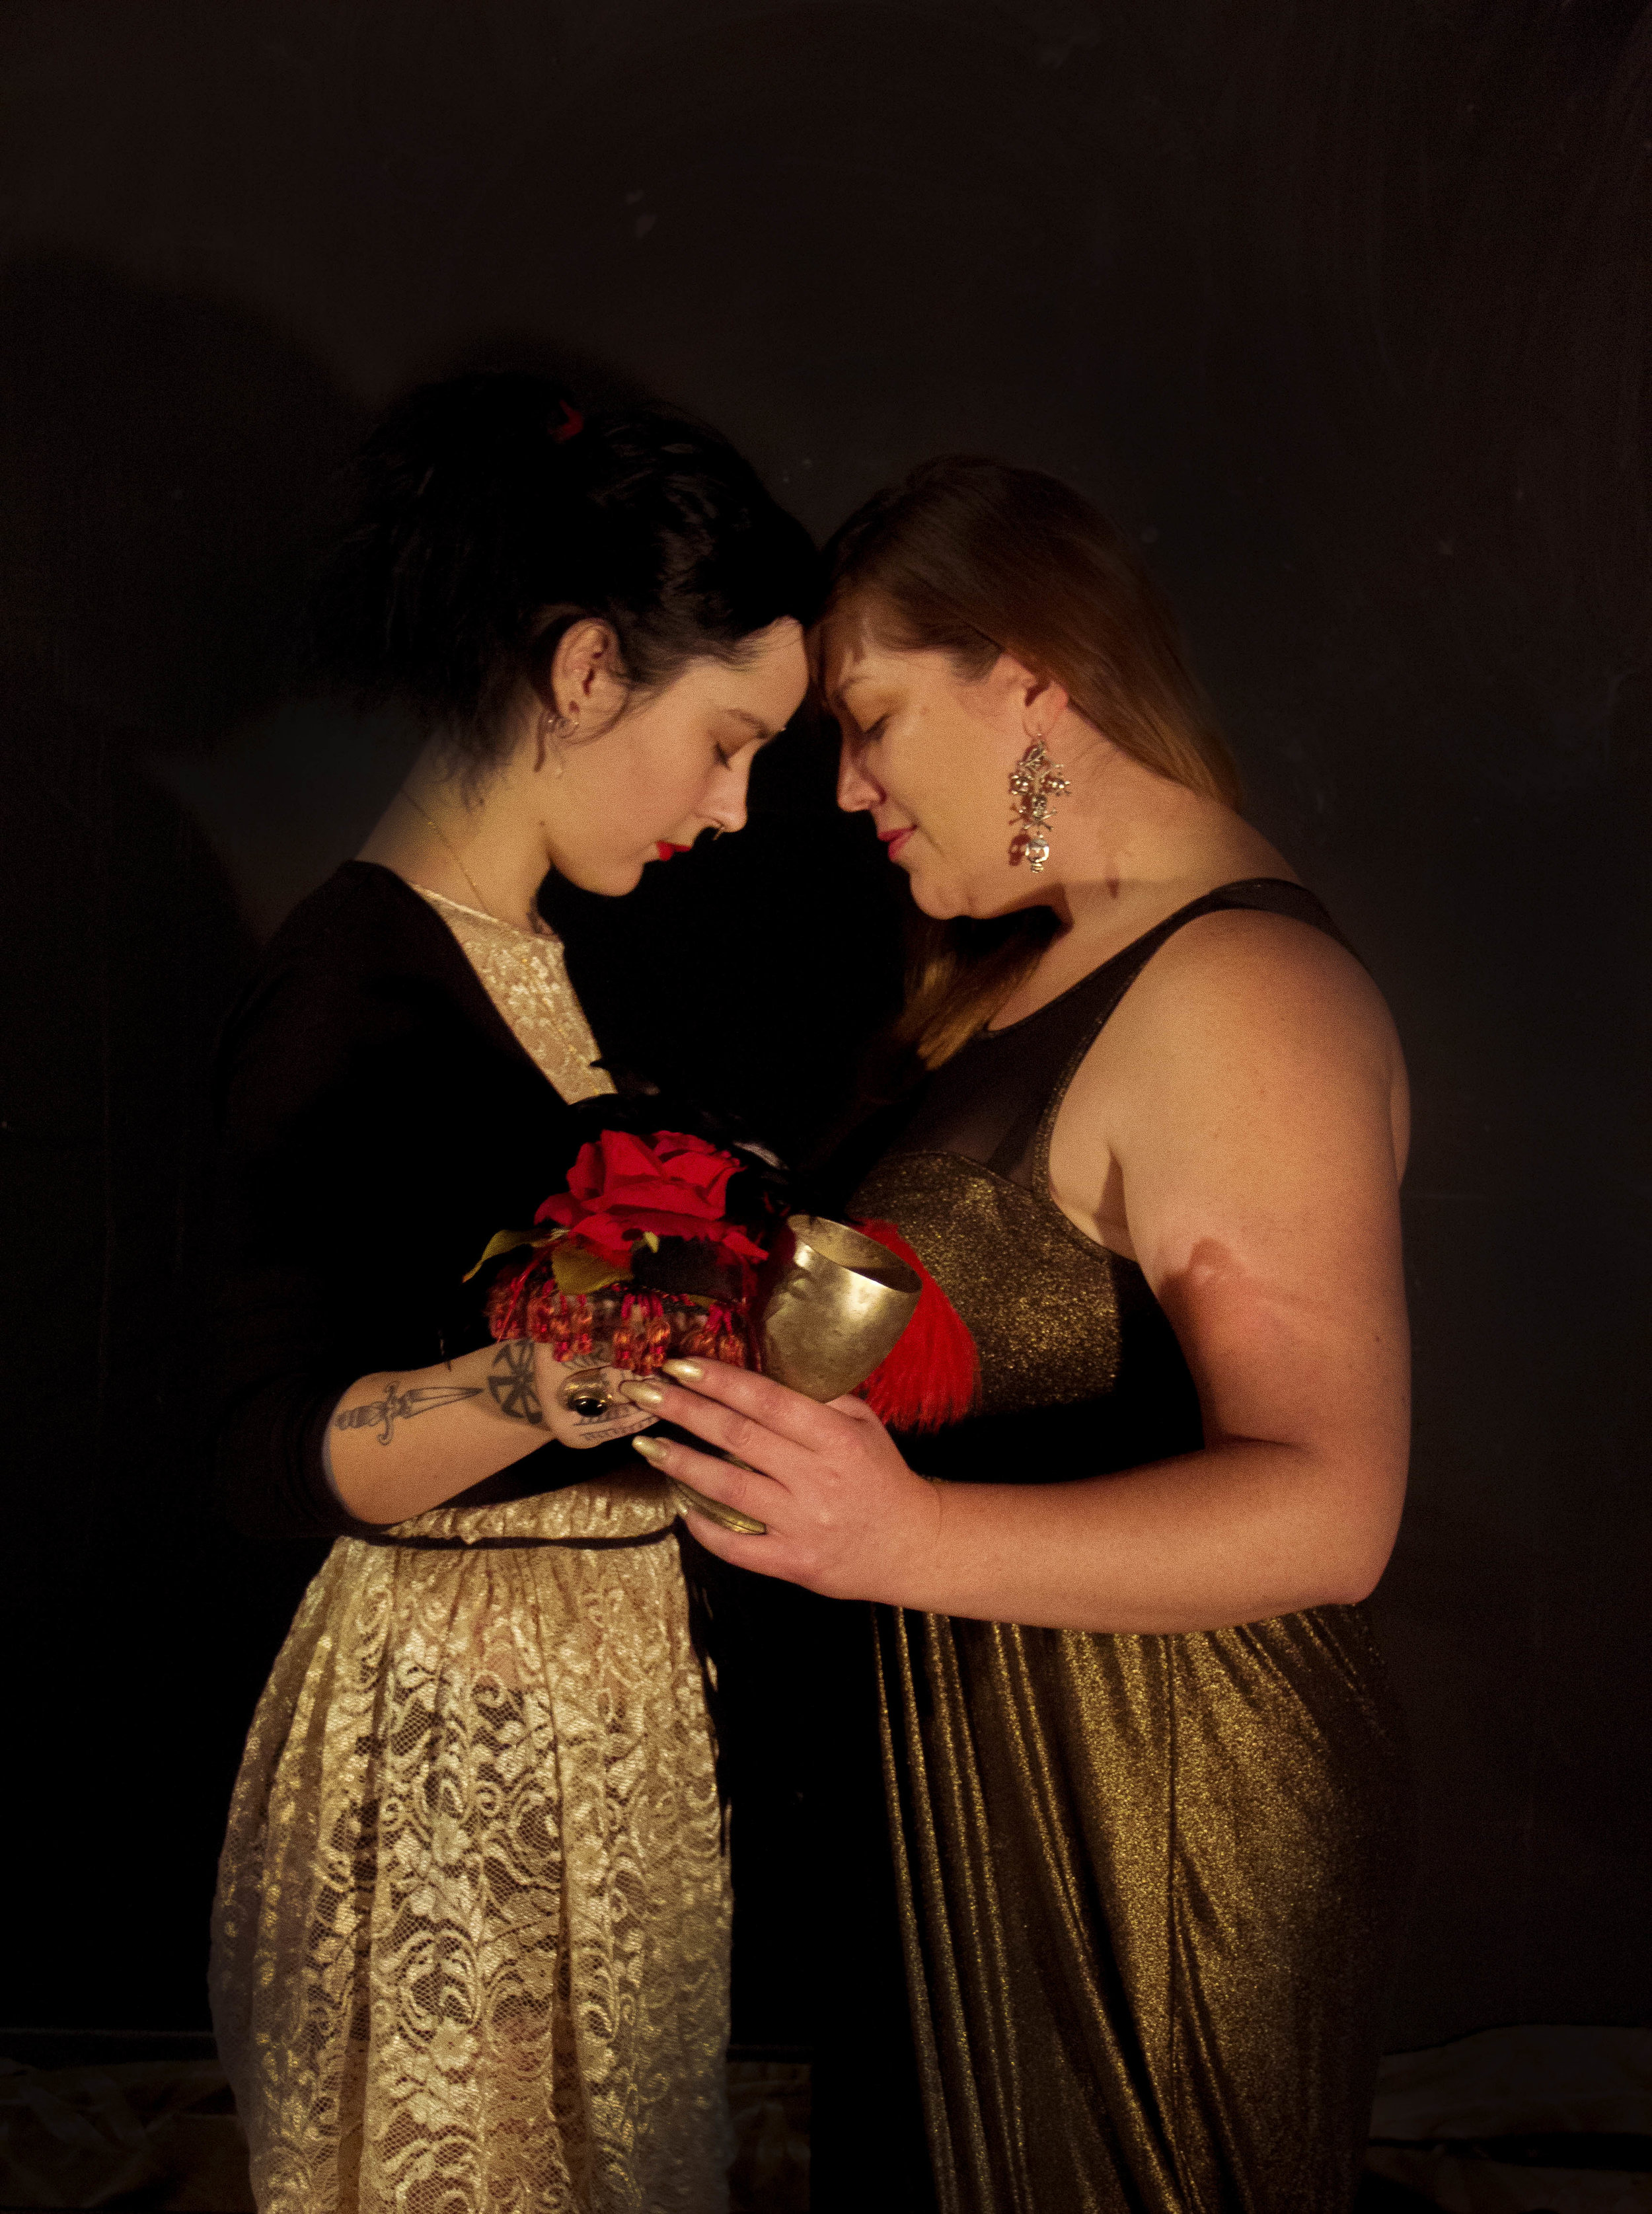 Novitiate Dasha Zarina and reader Blue June as The Lovers